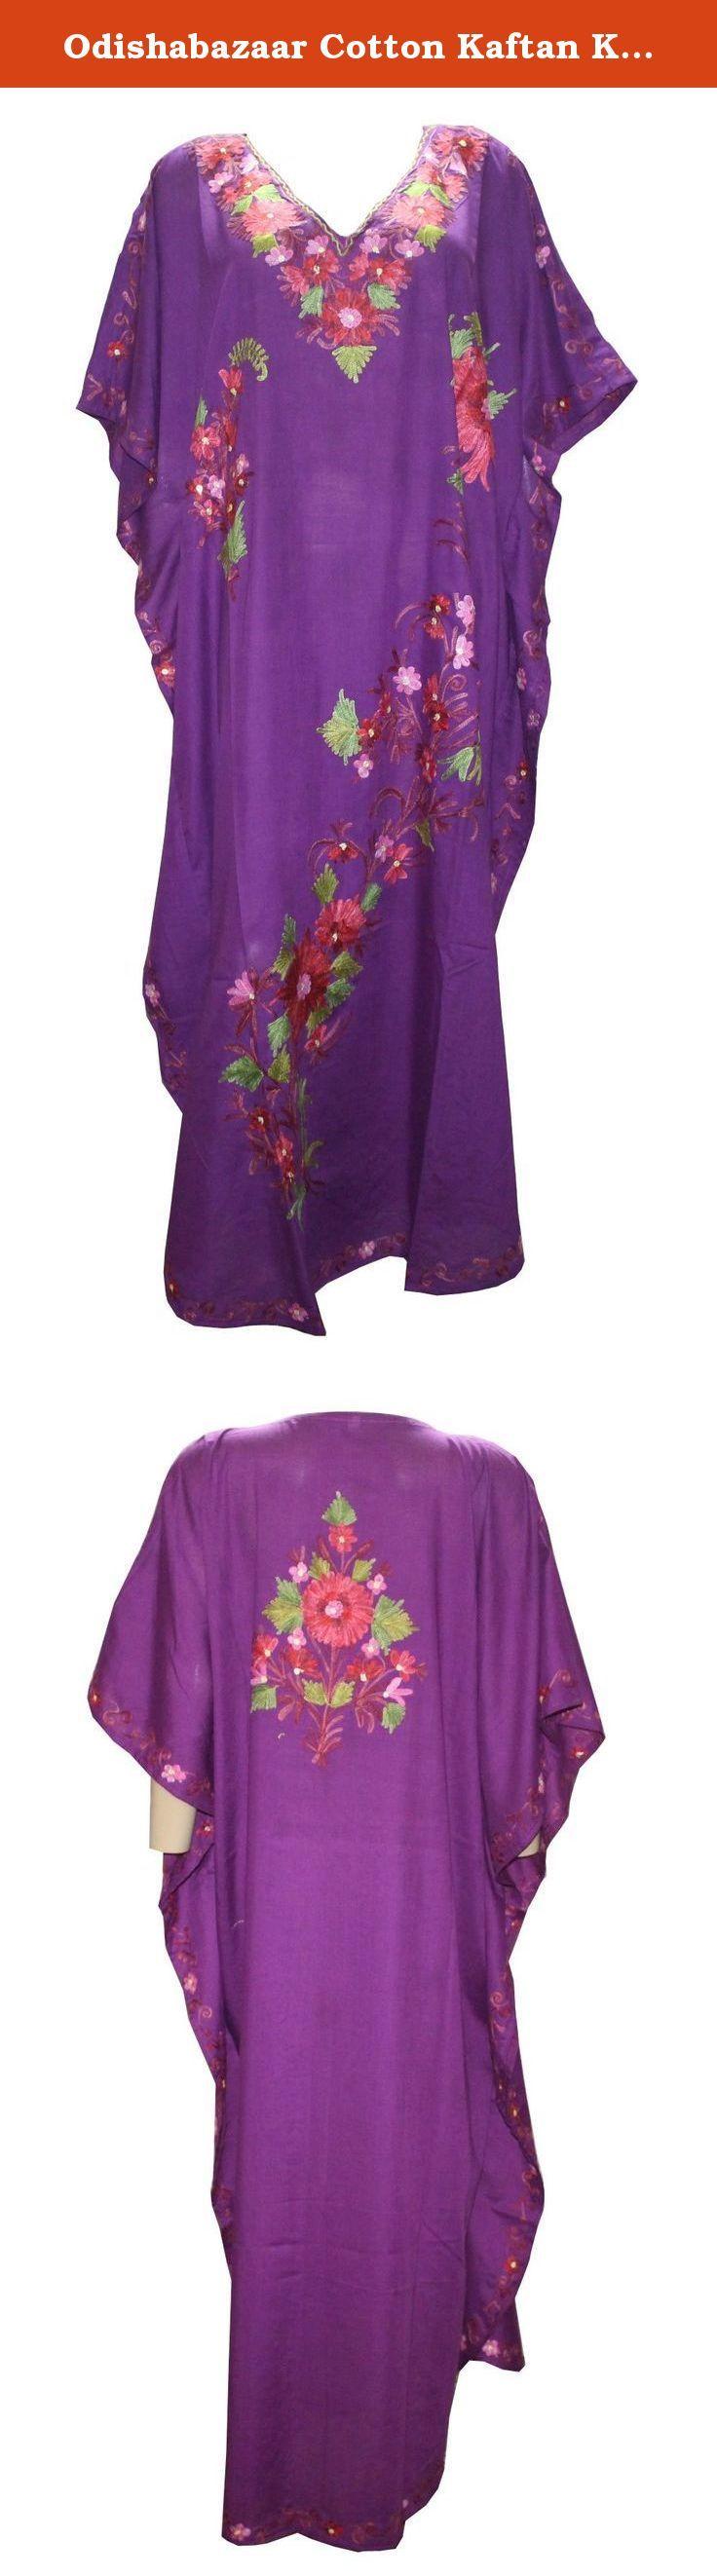 Odishabazaar Cotton Kaftan Kashmiri Embroidered Maxi Long Dress for Women (multi-10). Long length Kashmiri Kaftan/lounge wear/beach wear/ maxi dress with Ari Embroidered Flowers.